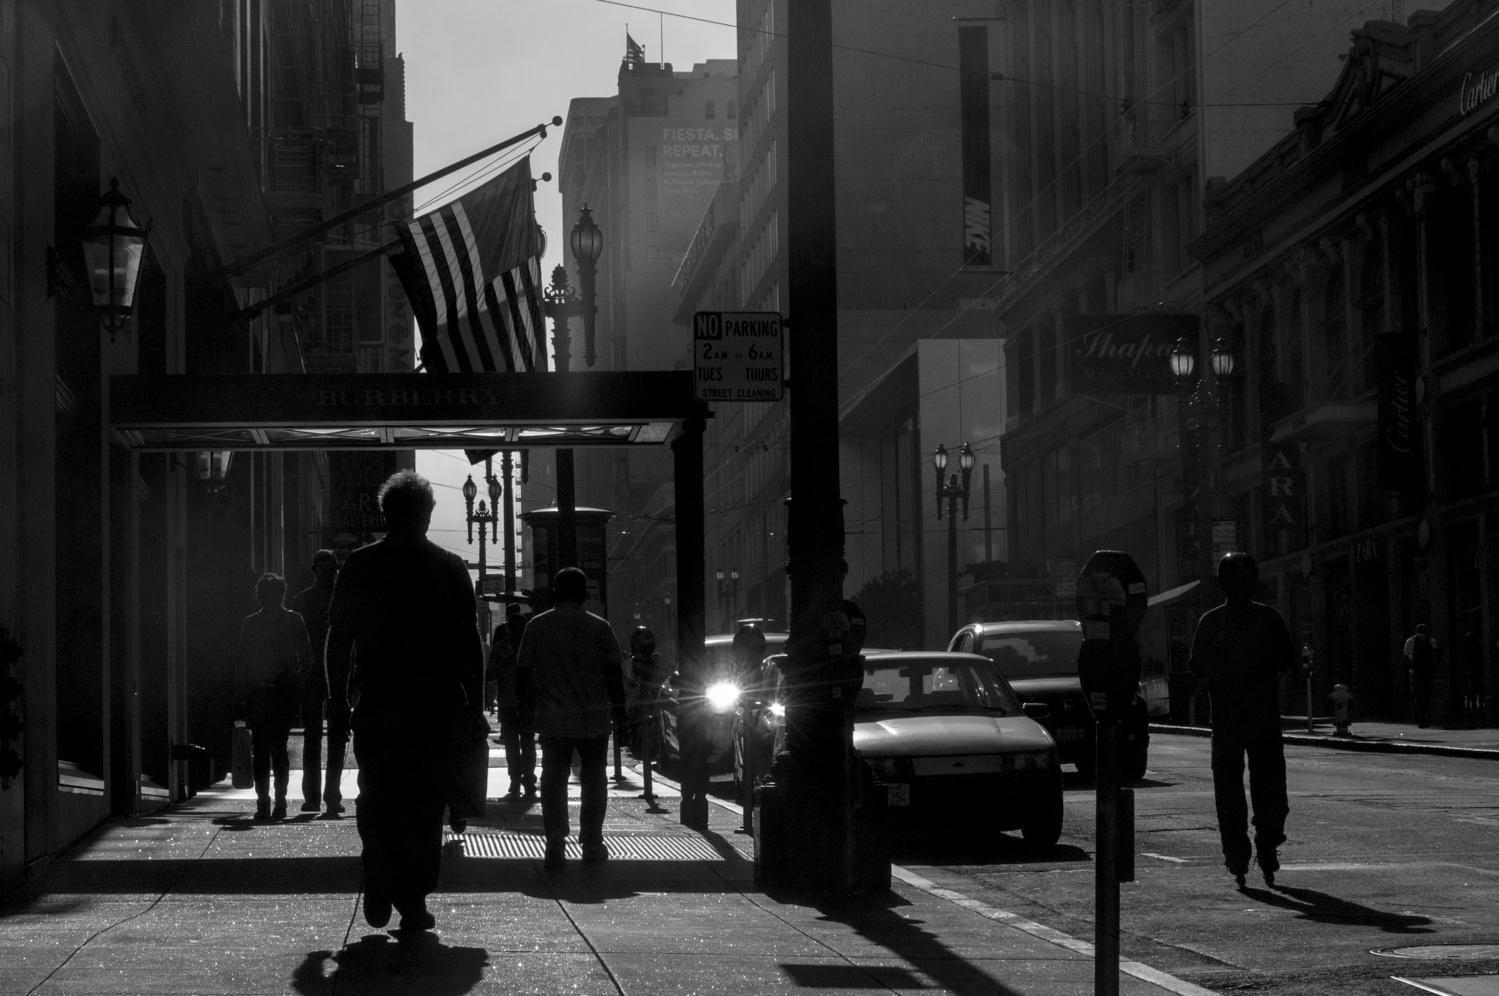 San Francisco Silhouette by Avram Silberztein